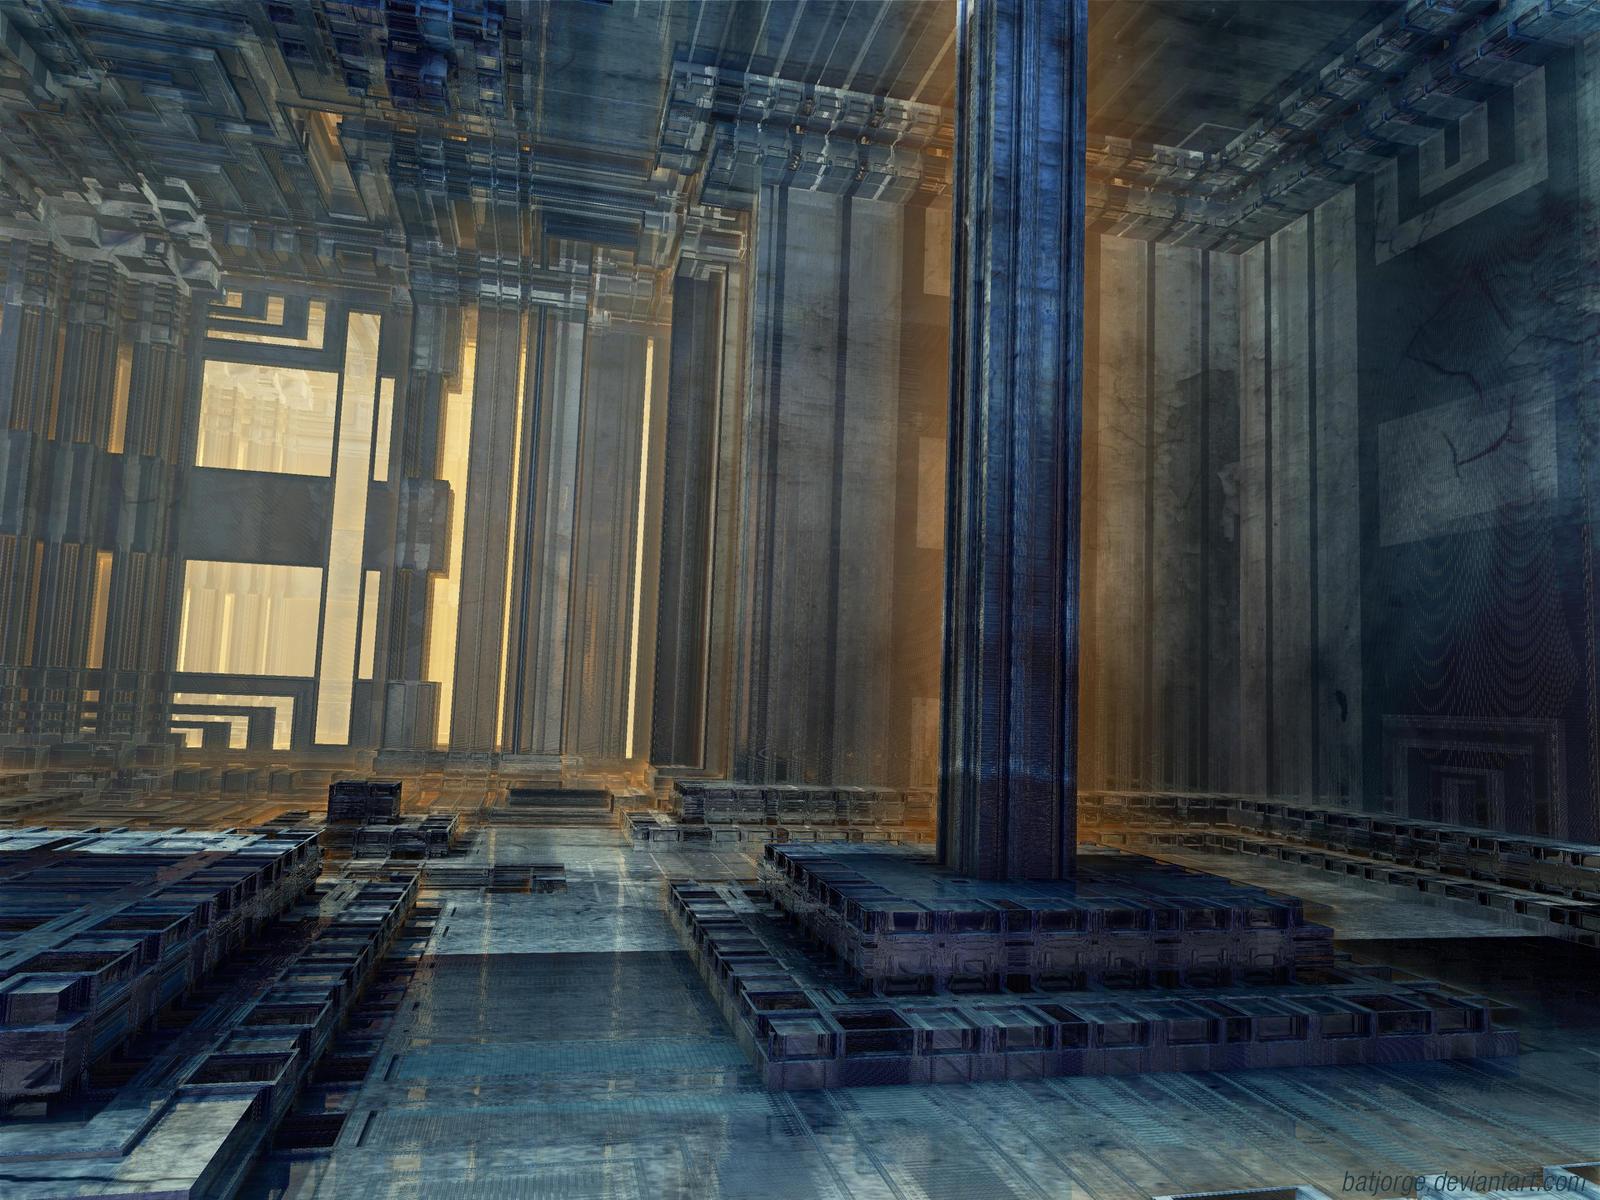 Futura lobby by batjorge